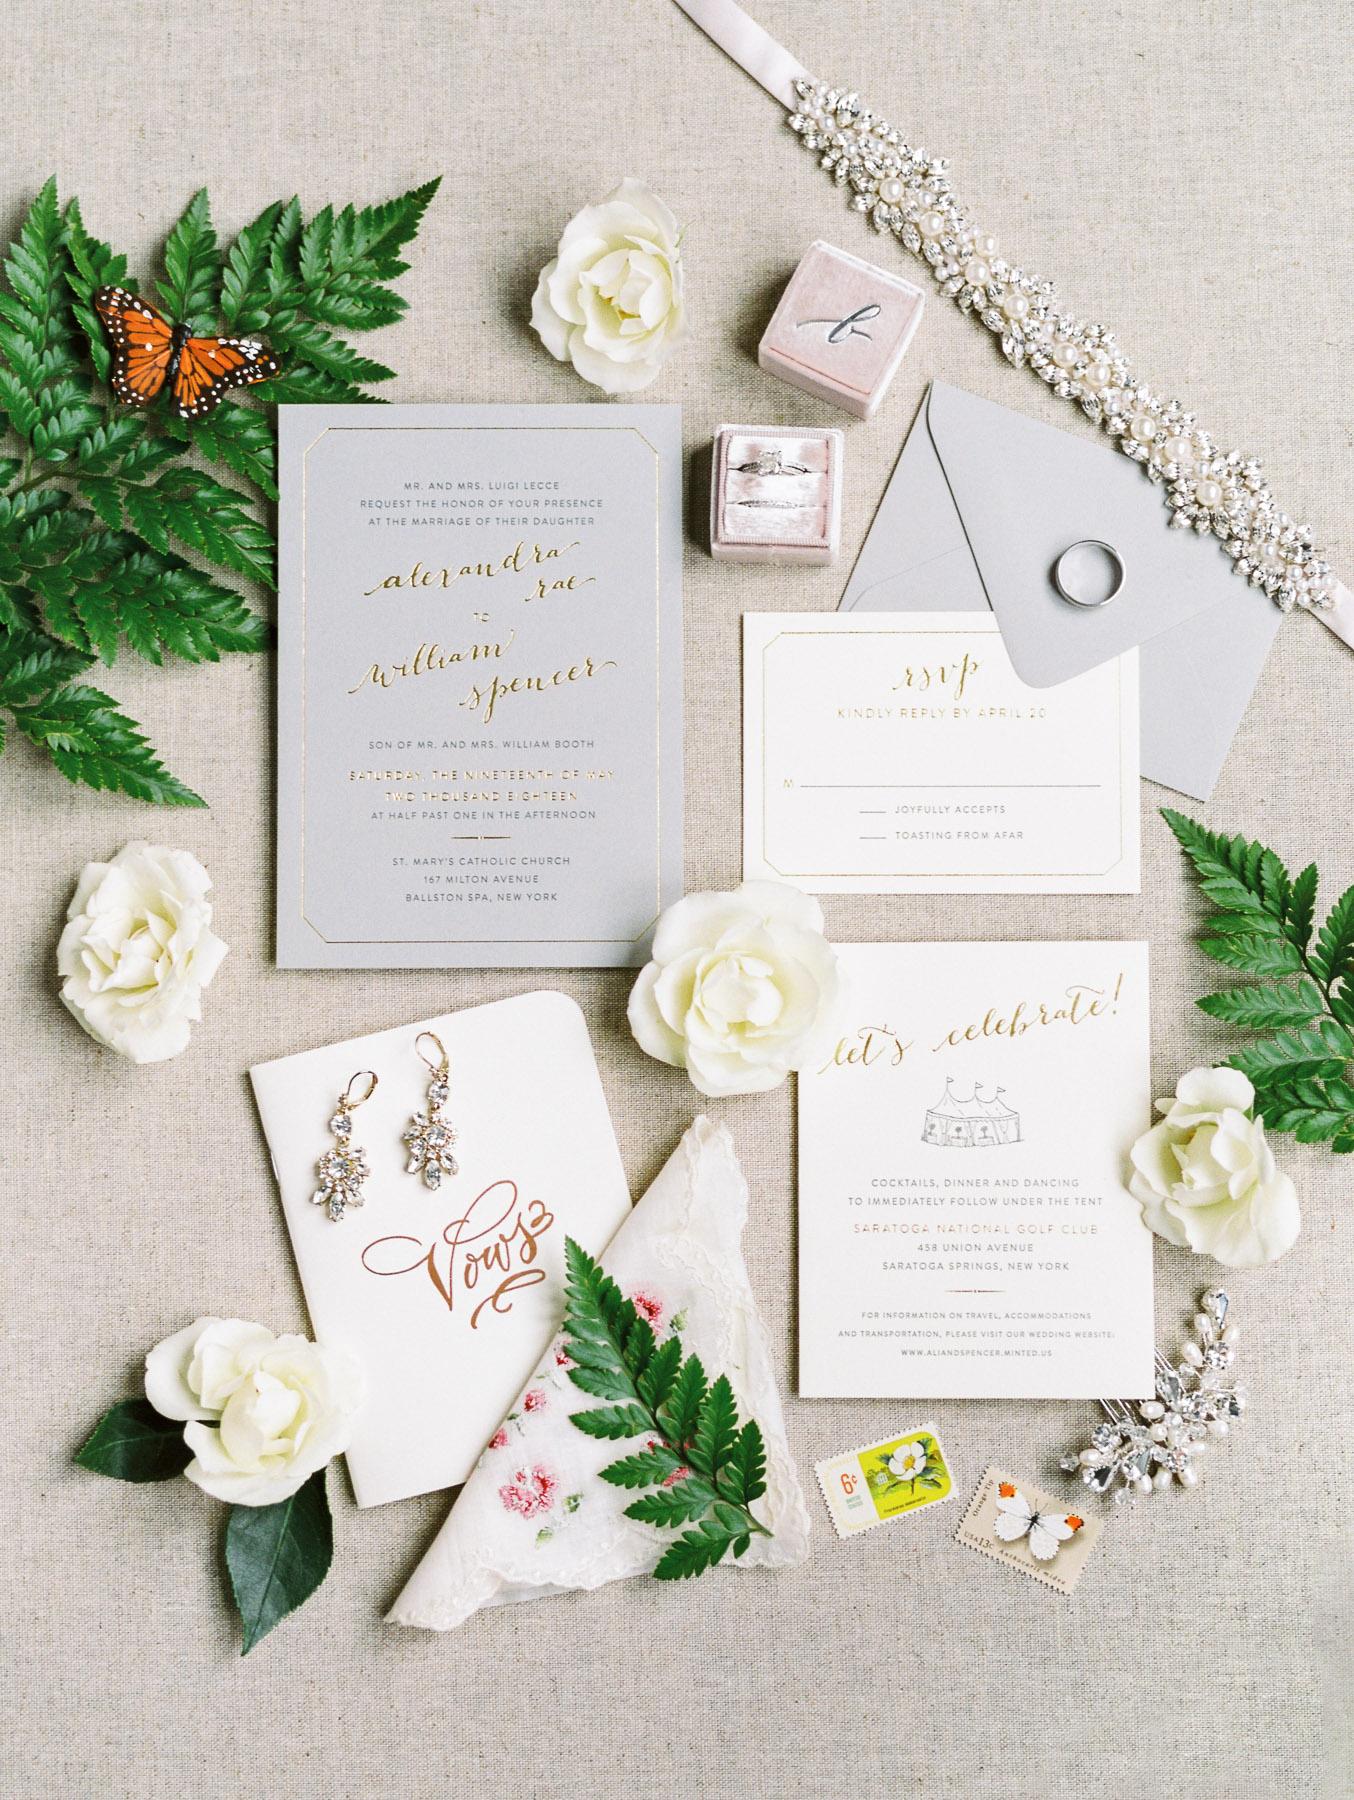 Invitation Design by Jenny C Design